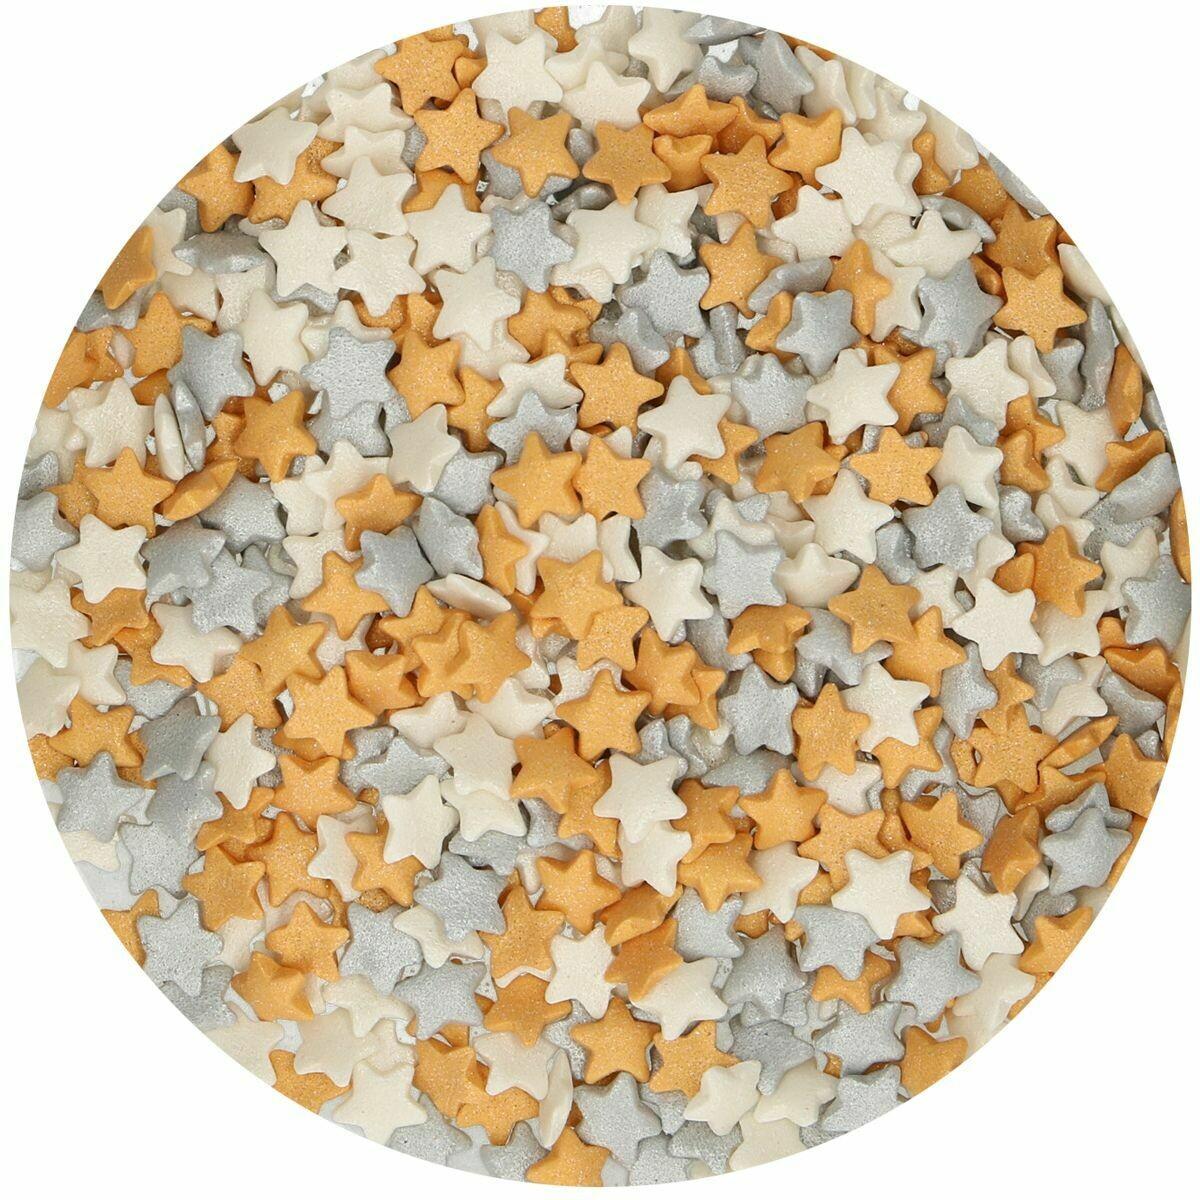 FunCakes Sprinkles -STARS -MIXED SIZED -GOLD & SILVER -Μείγμα Ζαχαρωτών Χρυσά και Ασημί Αστέρια 60γρ